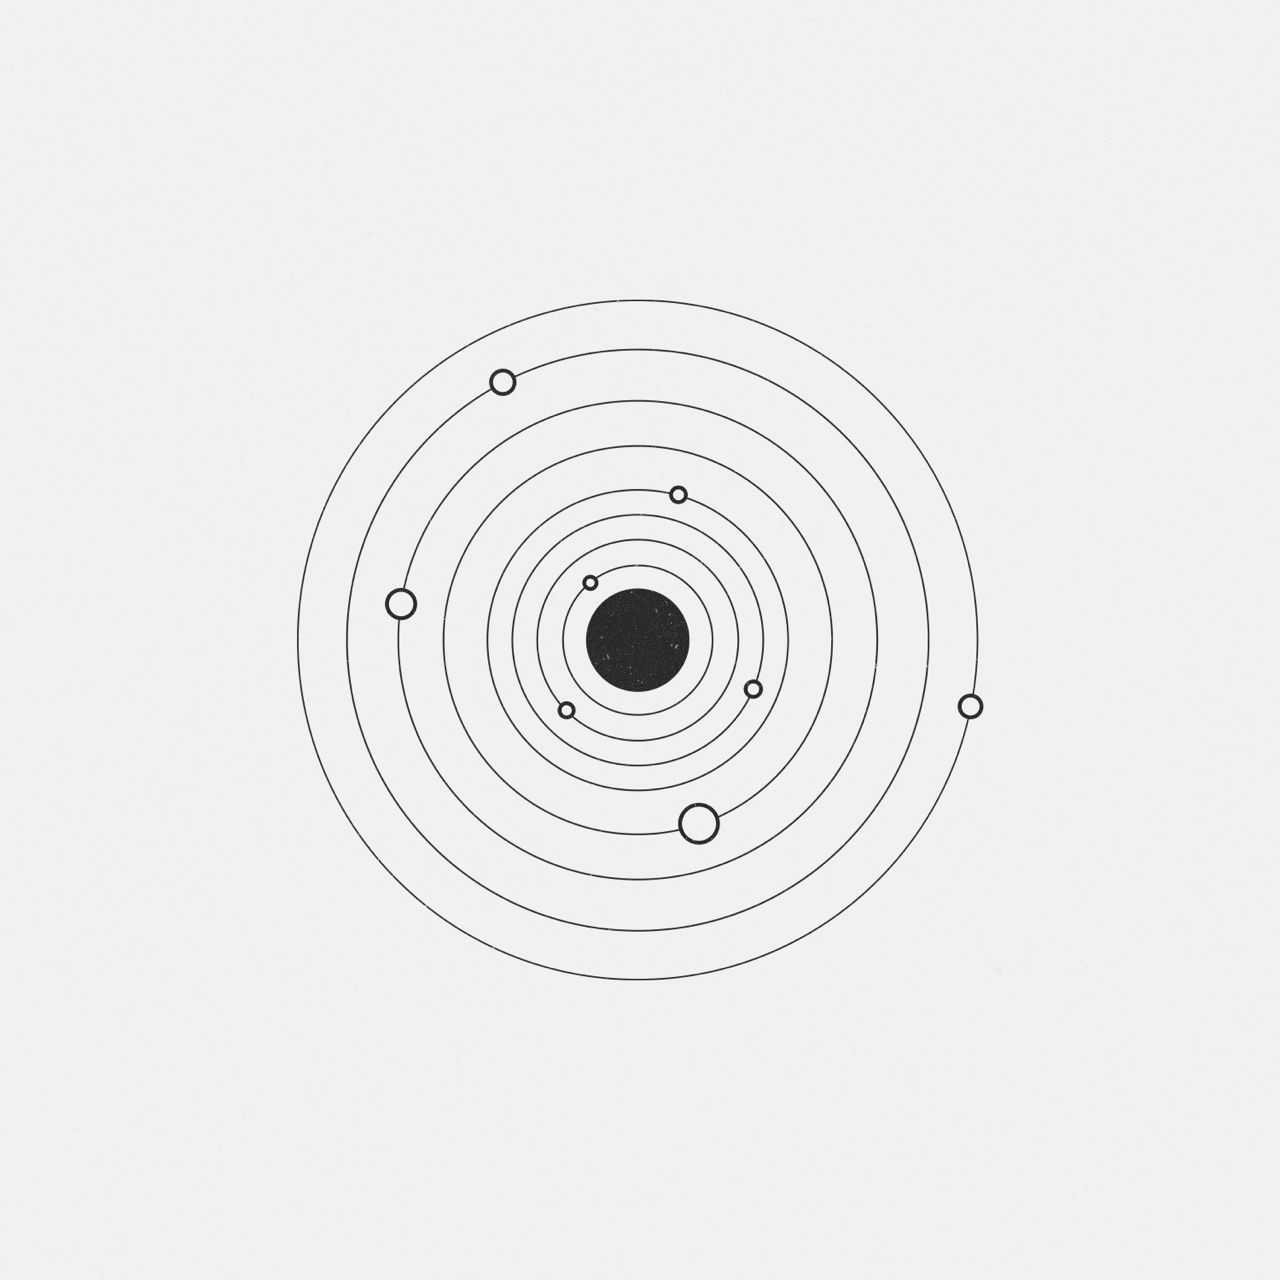 #MA16-513   A new geometric design every day